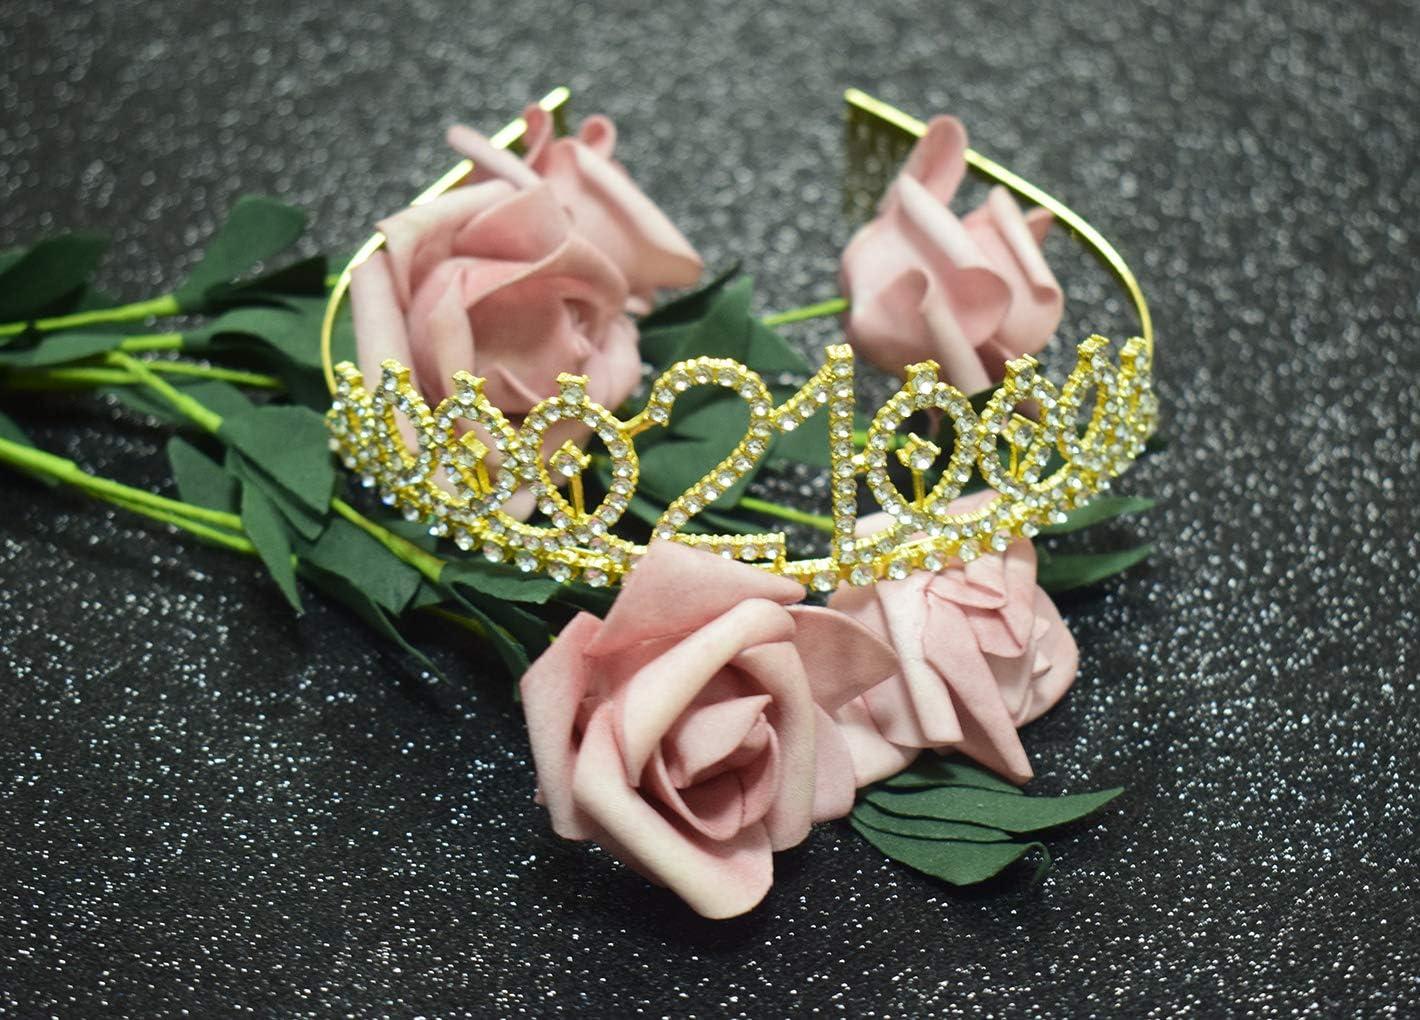 21st Birthday Party Supplies 21st Birthday Gold Tiara and Black Sash Kit Rhinestone Princess Crown and Glitter Satin Sash for Happy Birthday Party Favors Decorations